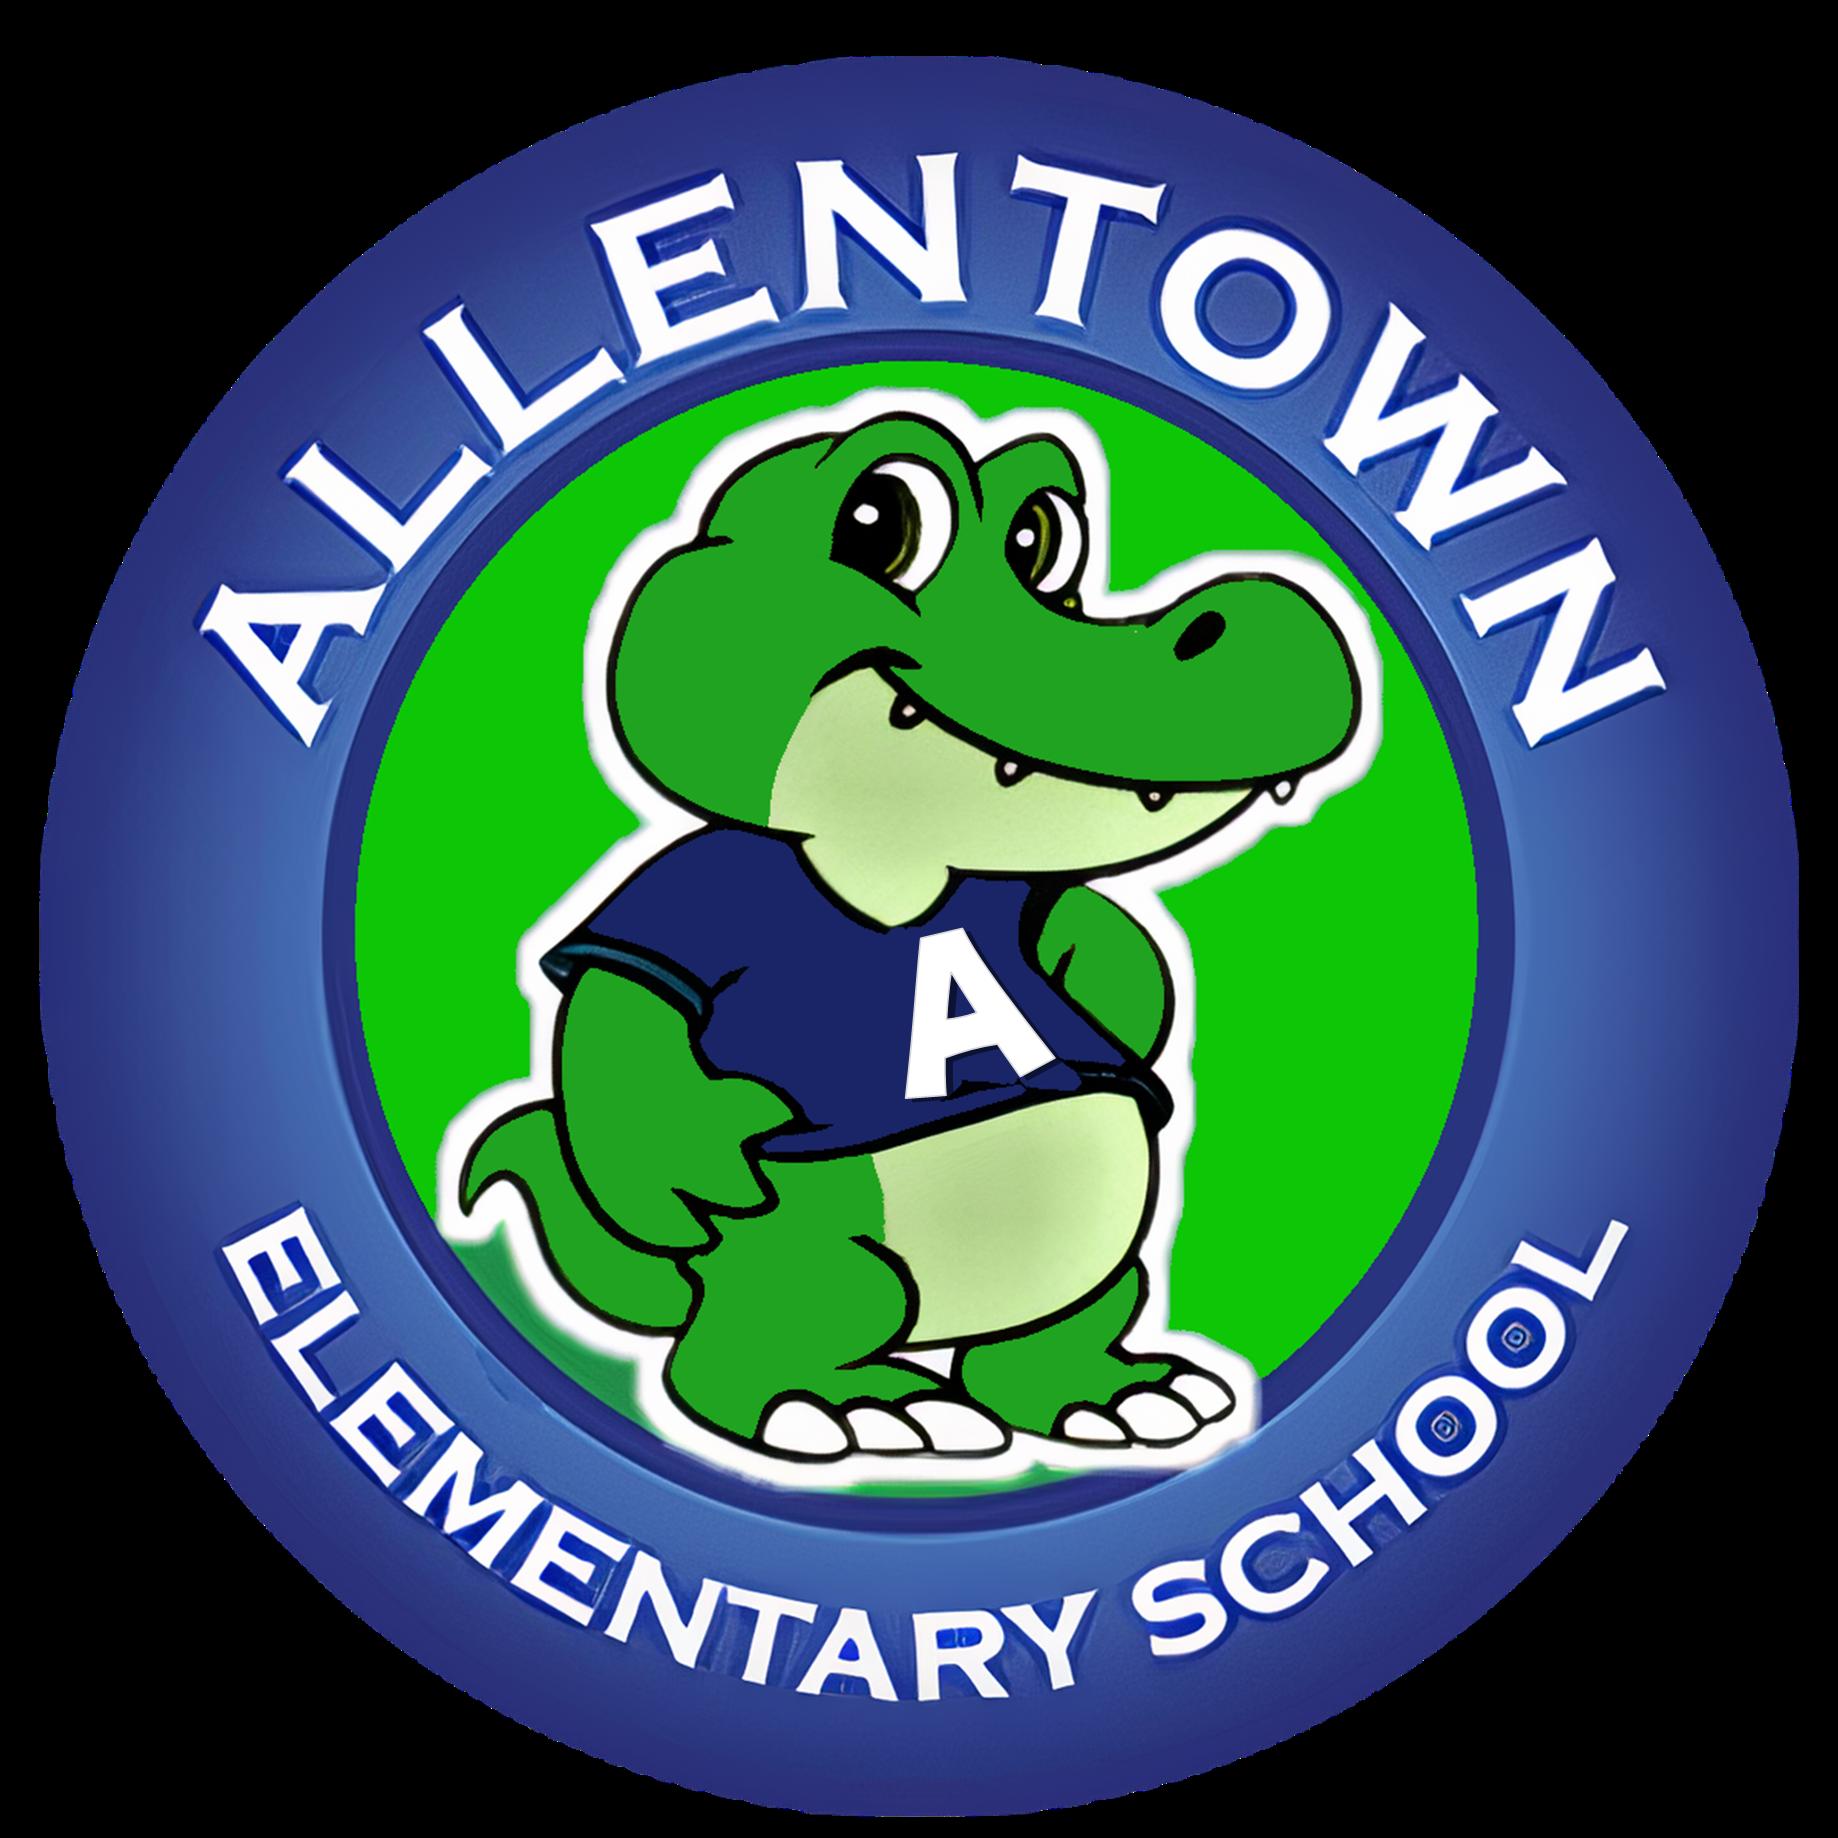 Allentown Logo Mascot